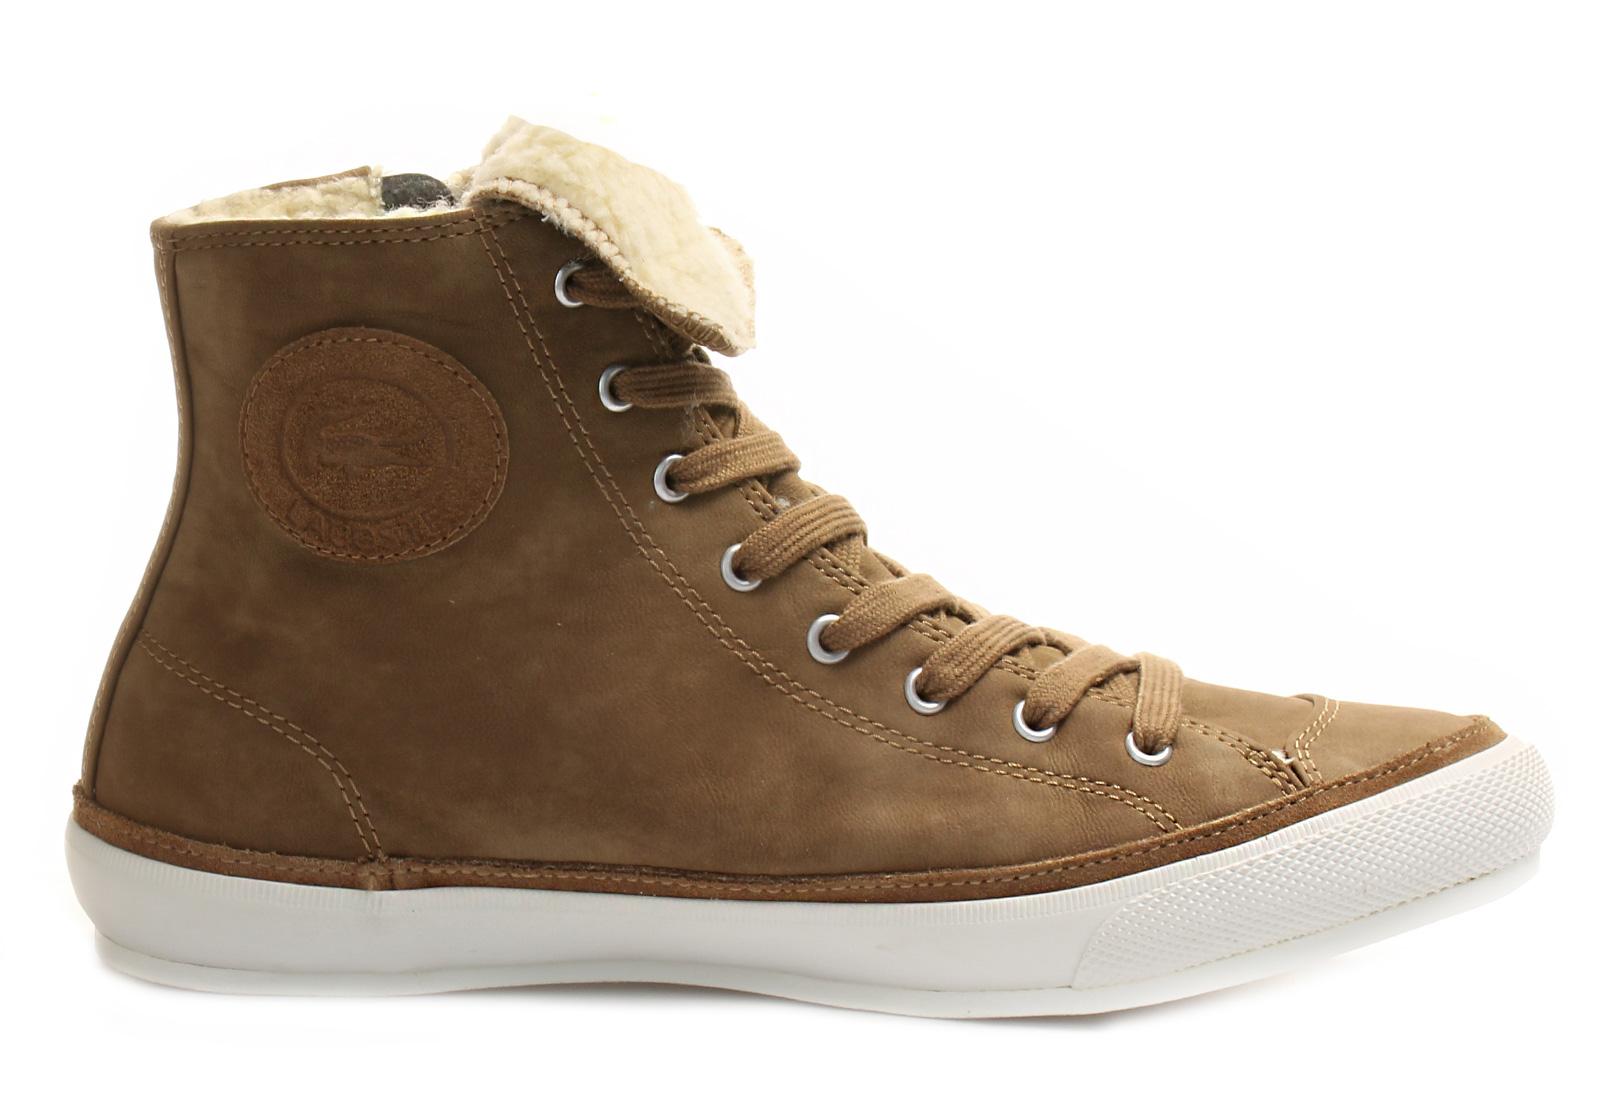 eea2217e2 Lacoste Shoes - Fairburn Mid - 133srw0115-013 - Online shop for ...